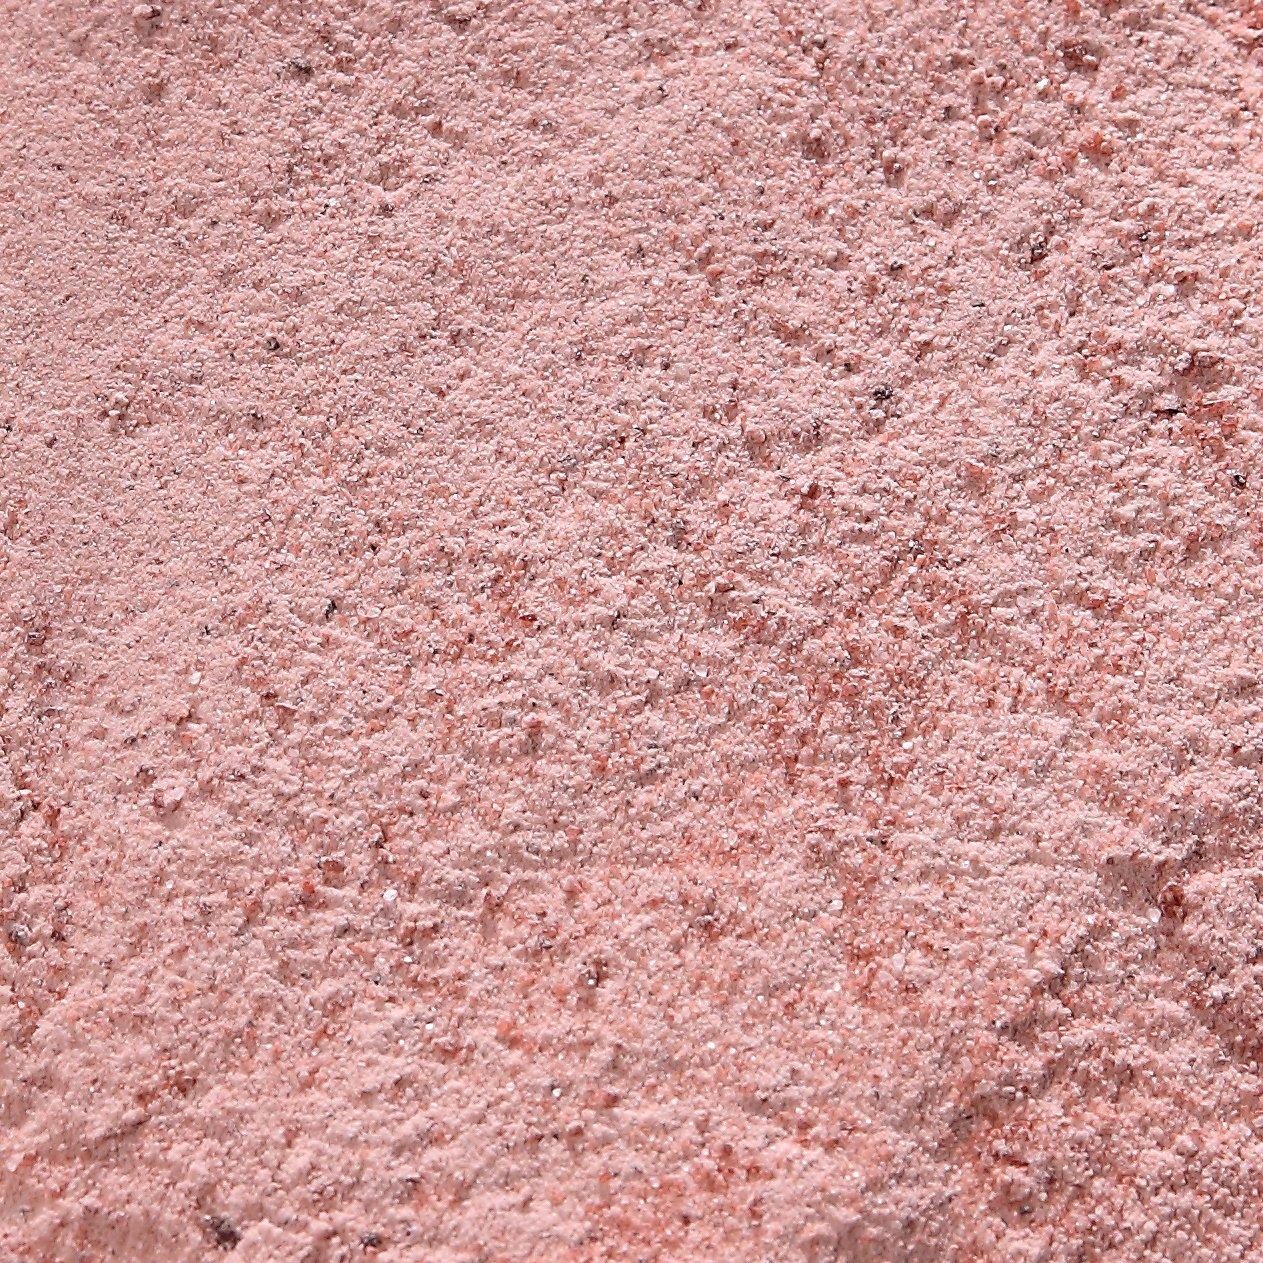 The Spice Lab Kala Namak Himalayan Black Crystal Indian Salt - Mineral Enriched Kosher Gluten-Free All Natural Salt - Fine Ground - 2 Pound